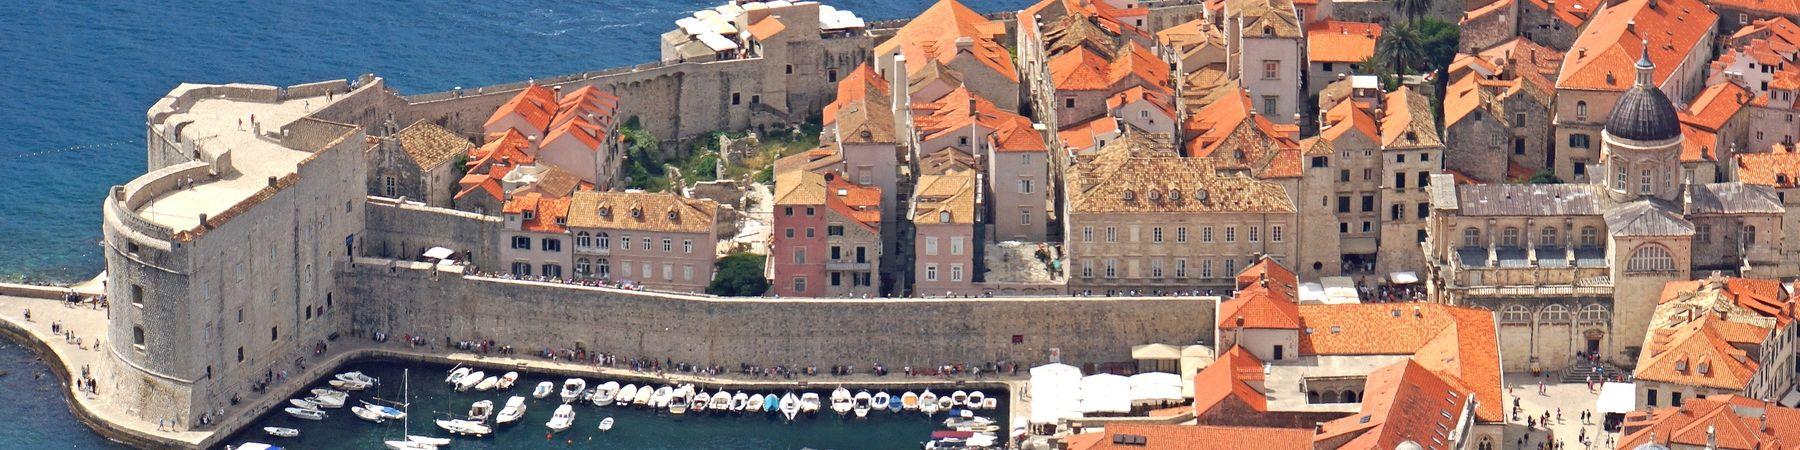 Dubrovnik Travel Guide Wikitravel Croatia Tourism Dubrovnik Dubrovnik Croatia